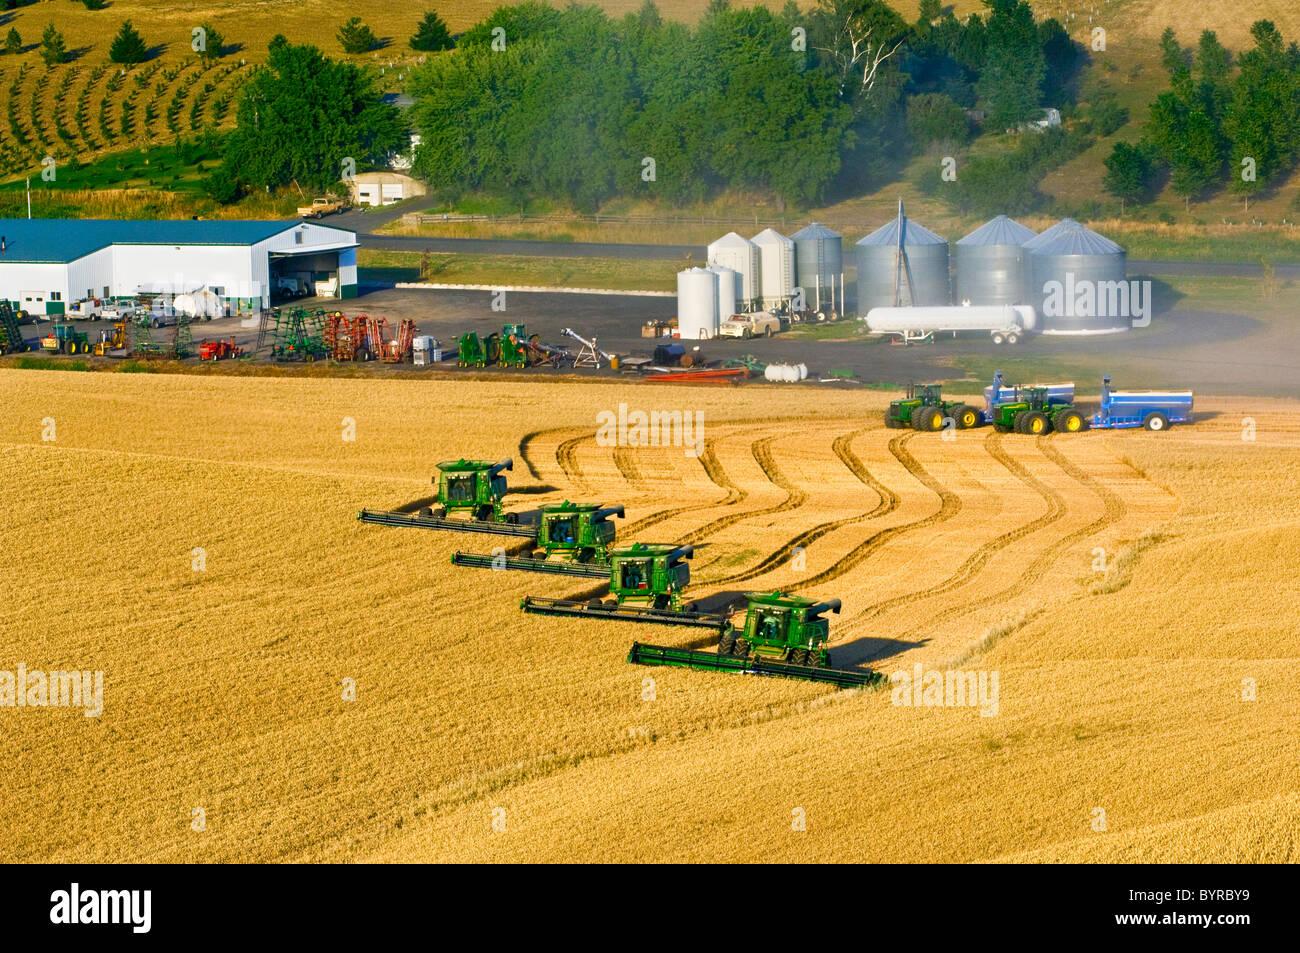 Four John Deere combines harvest wheat in tandem near the farm shop and maintenance yard / near Pullman, Washington, - Stock Image